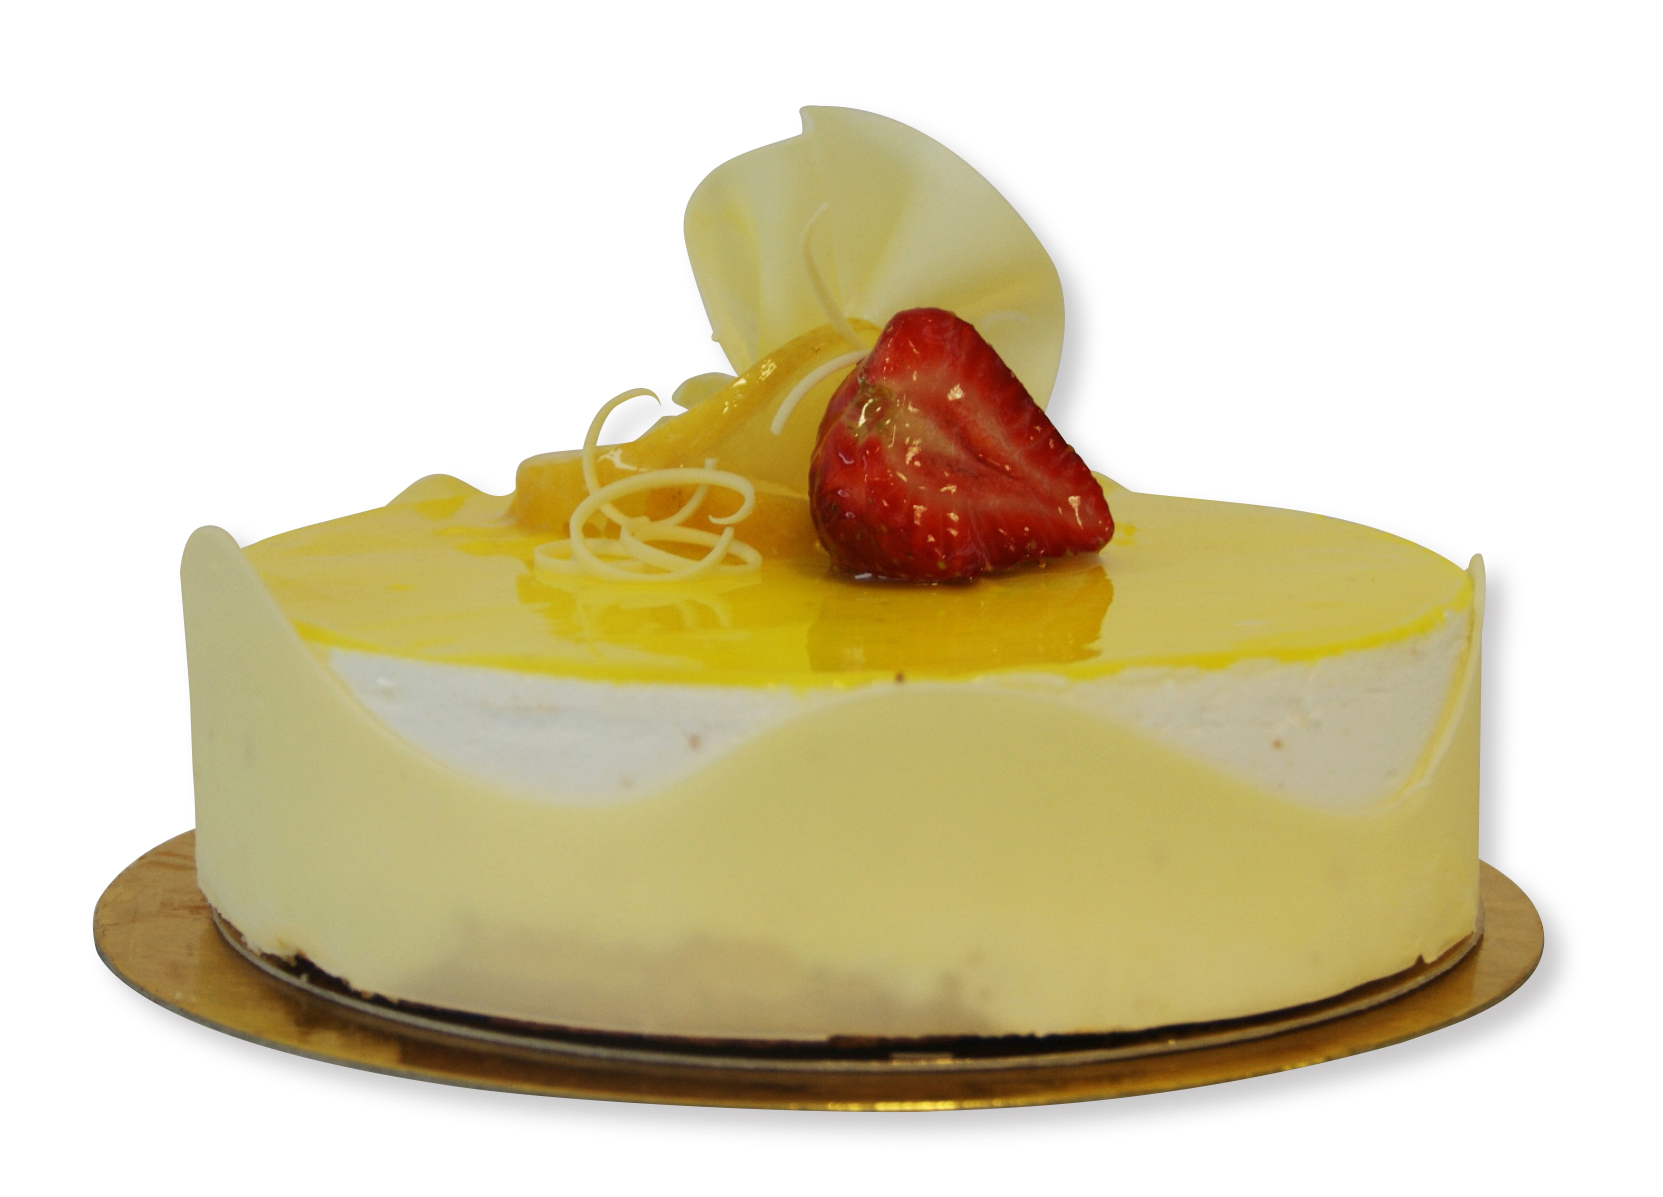 Semifrío de yogurt y limón